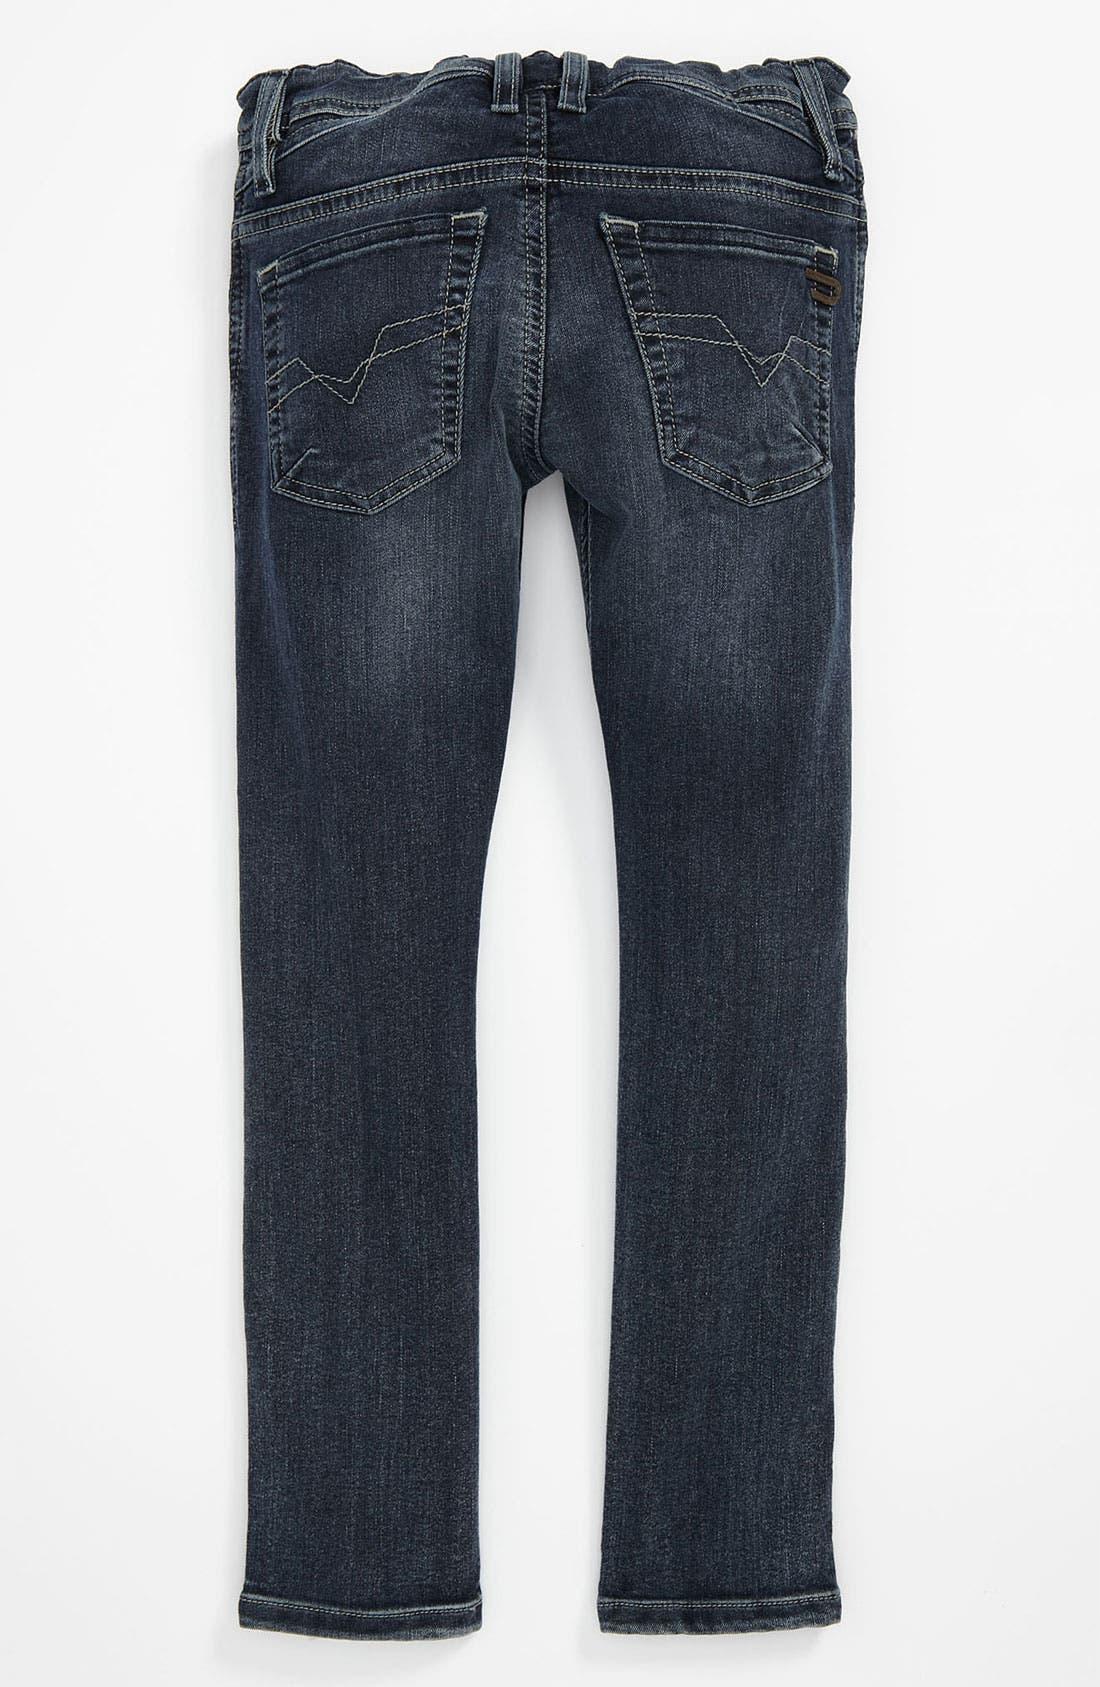 Main Image - DIESEL® 'Shioner' Jeans (Little Boys & Big Boys)